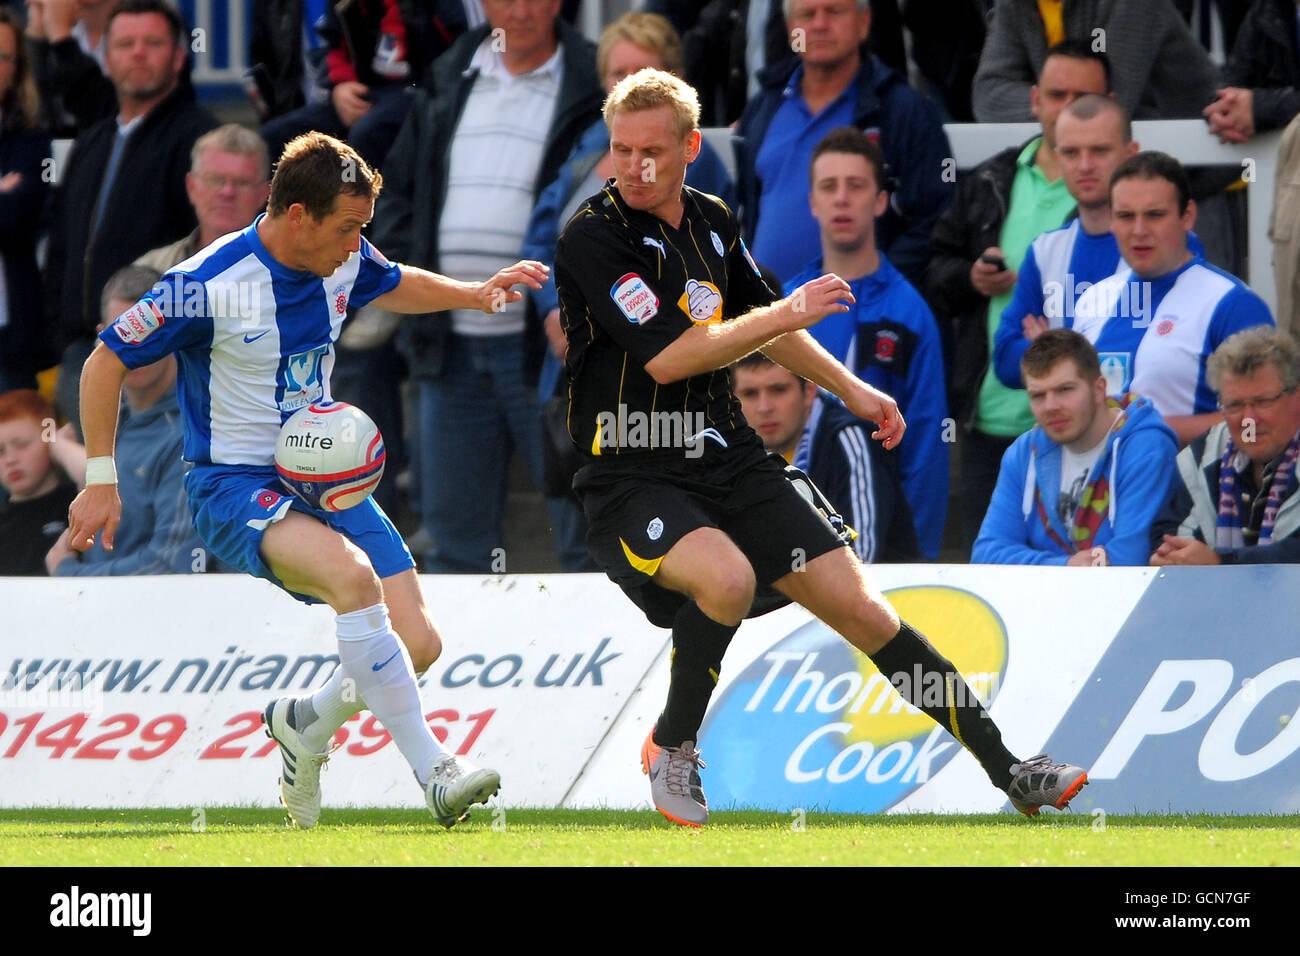 Soccer - npower Football League One - Hartlepool United v Sheffield Wednesday - Victoria Park - Stock Image